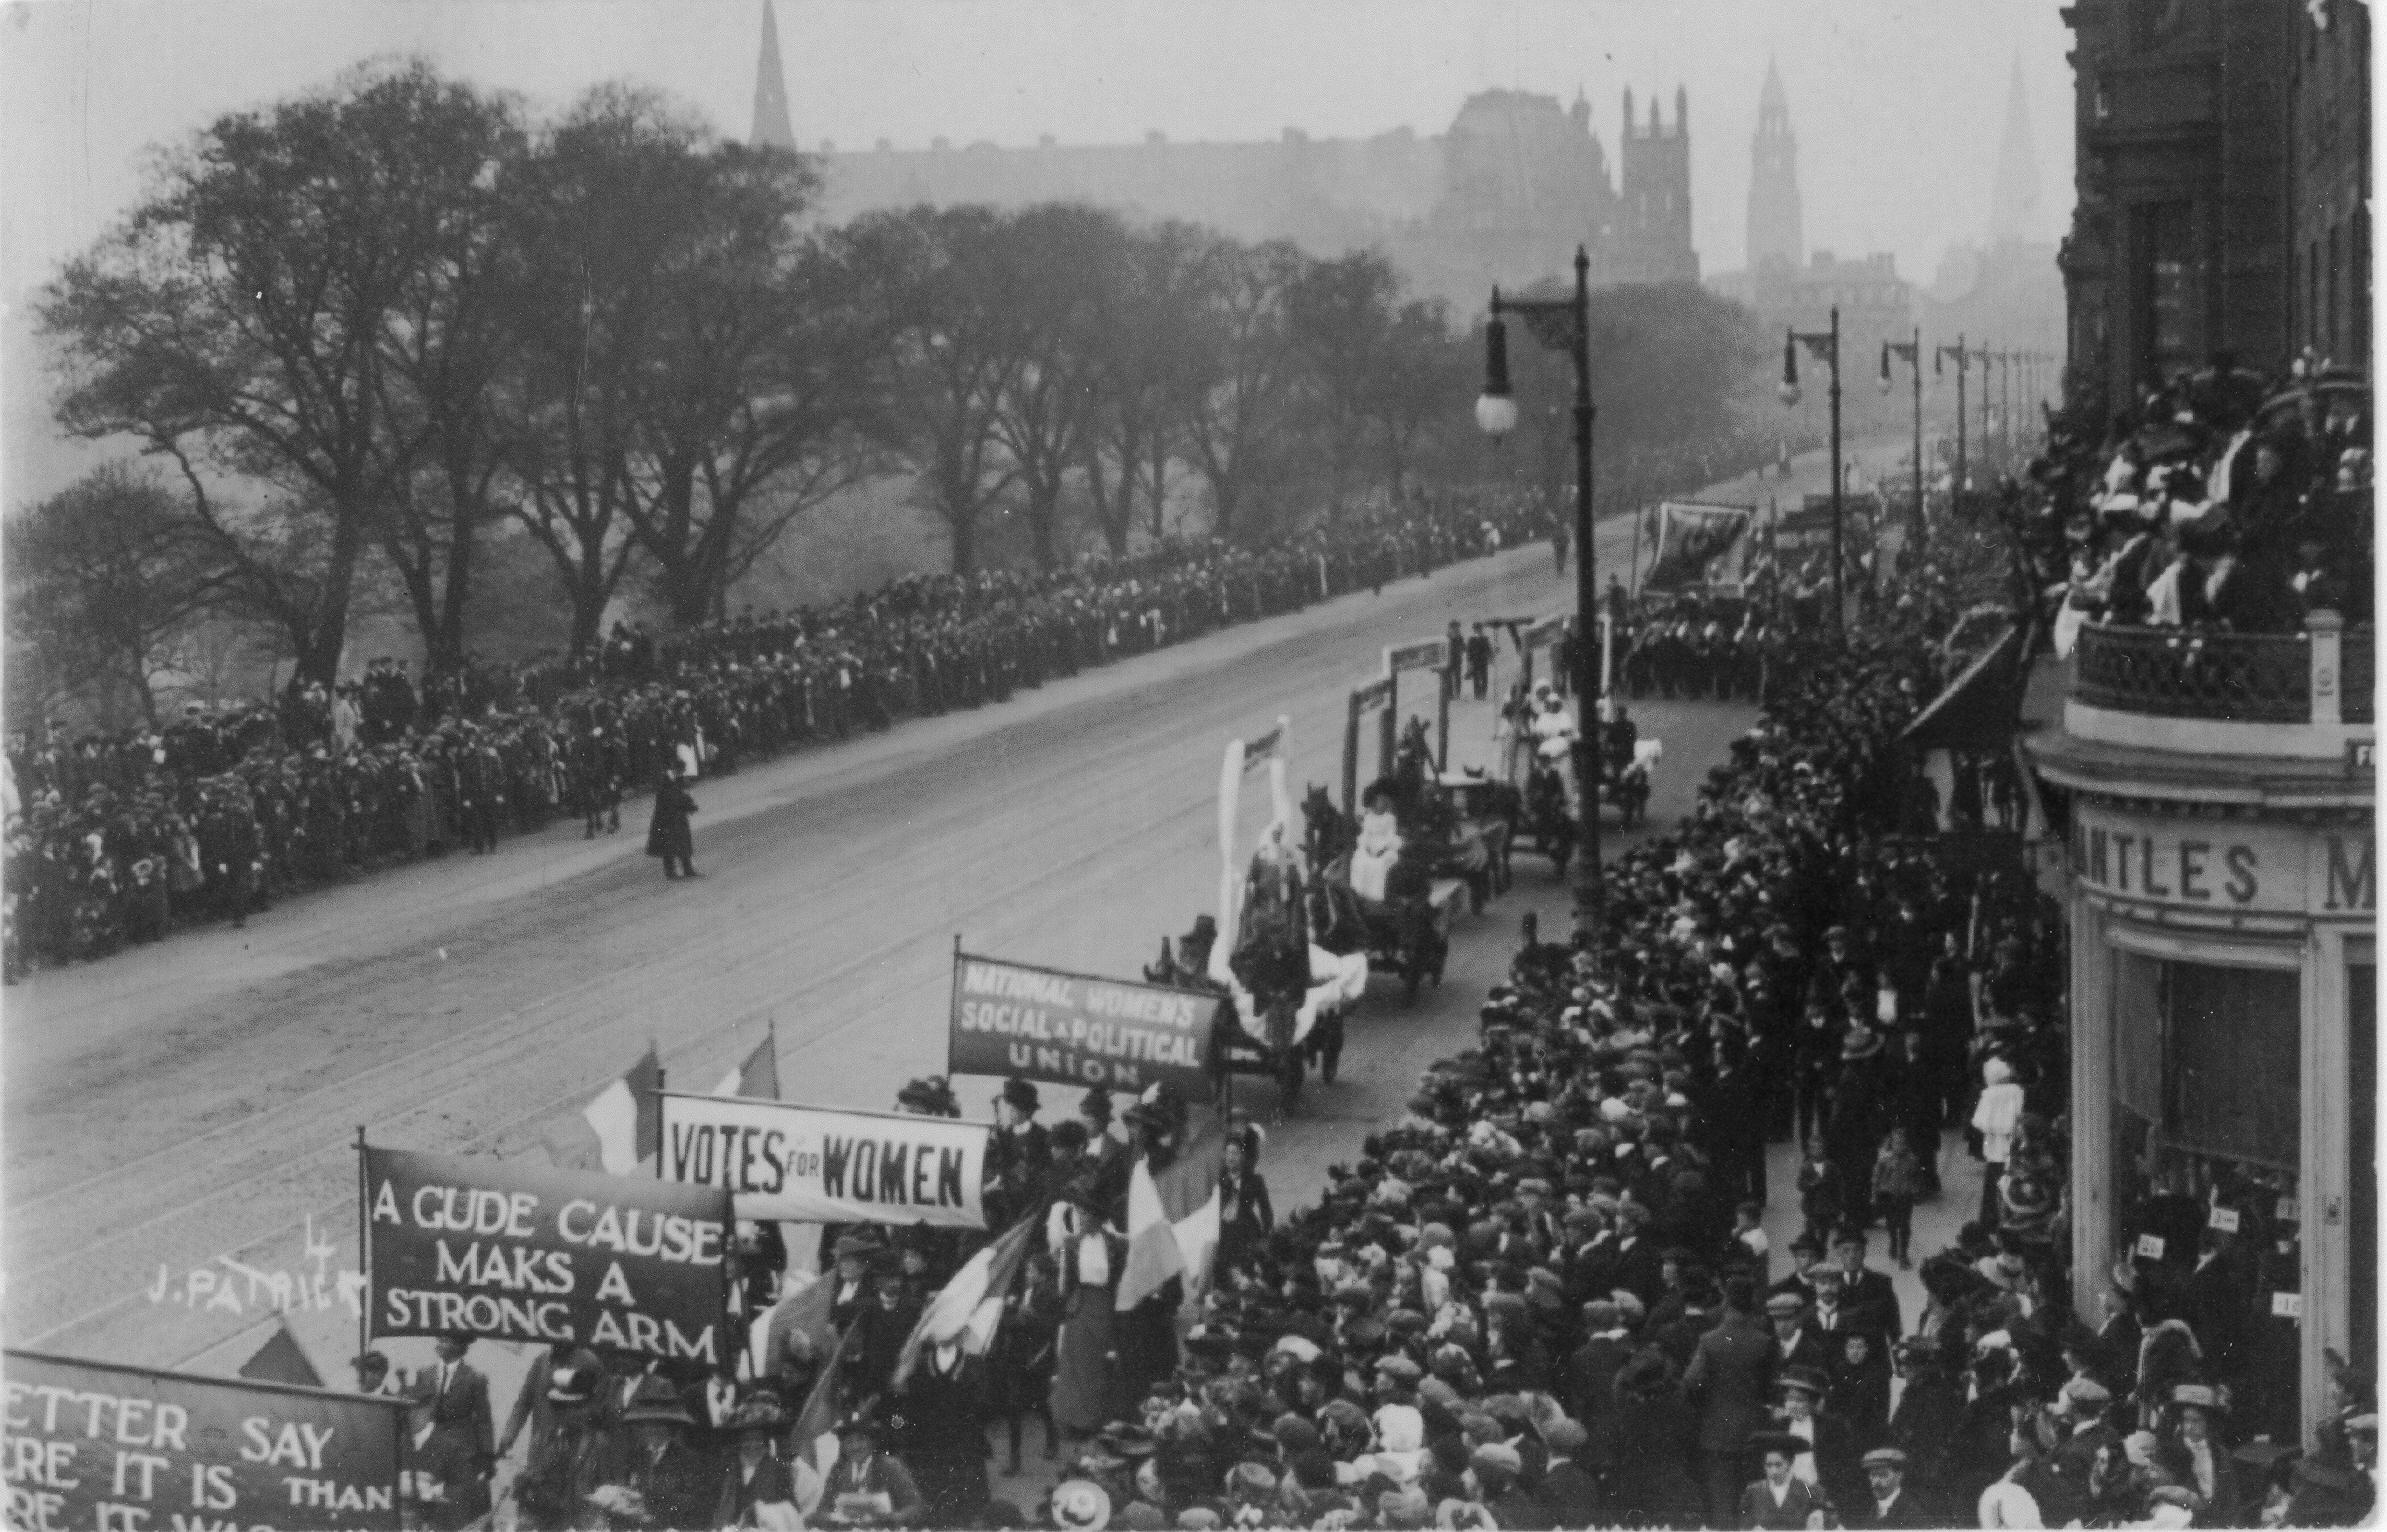 Protesto pelo direito ao sufrágio femino na Inglaterra, 1909